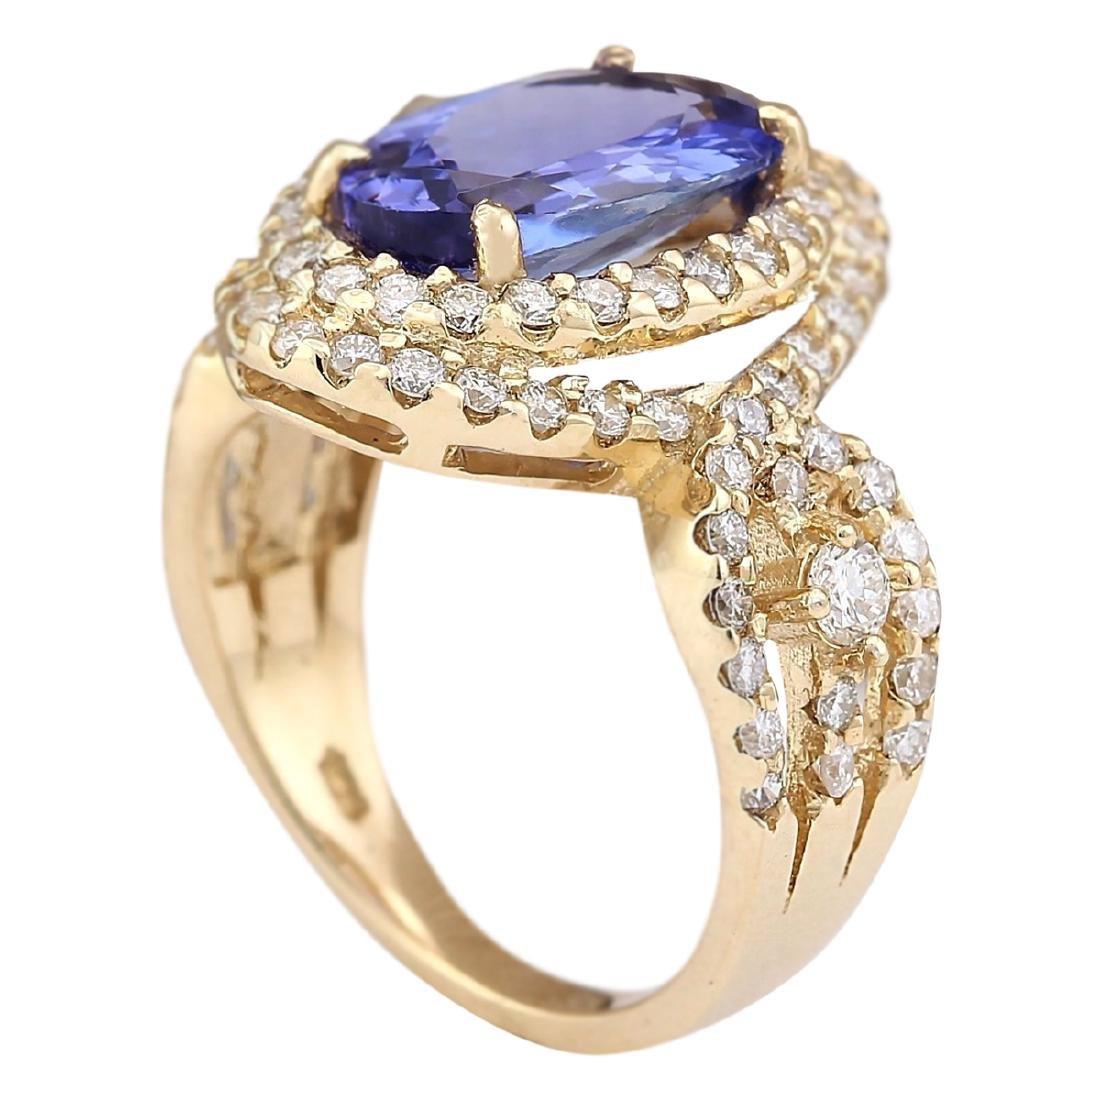 5.11 CTW Natural Tanzanite And Diamond Ring In 18K - 3